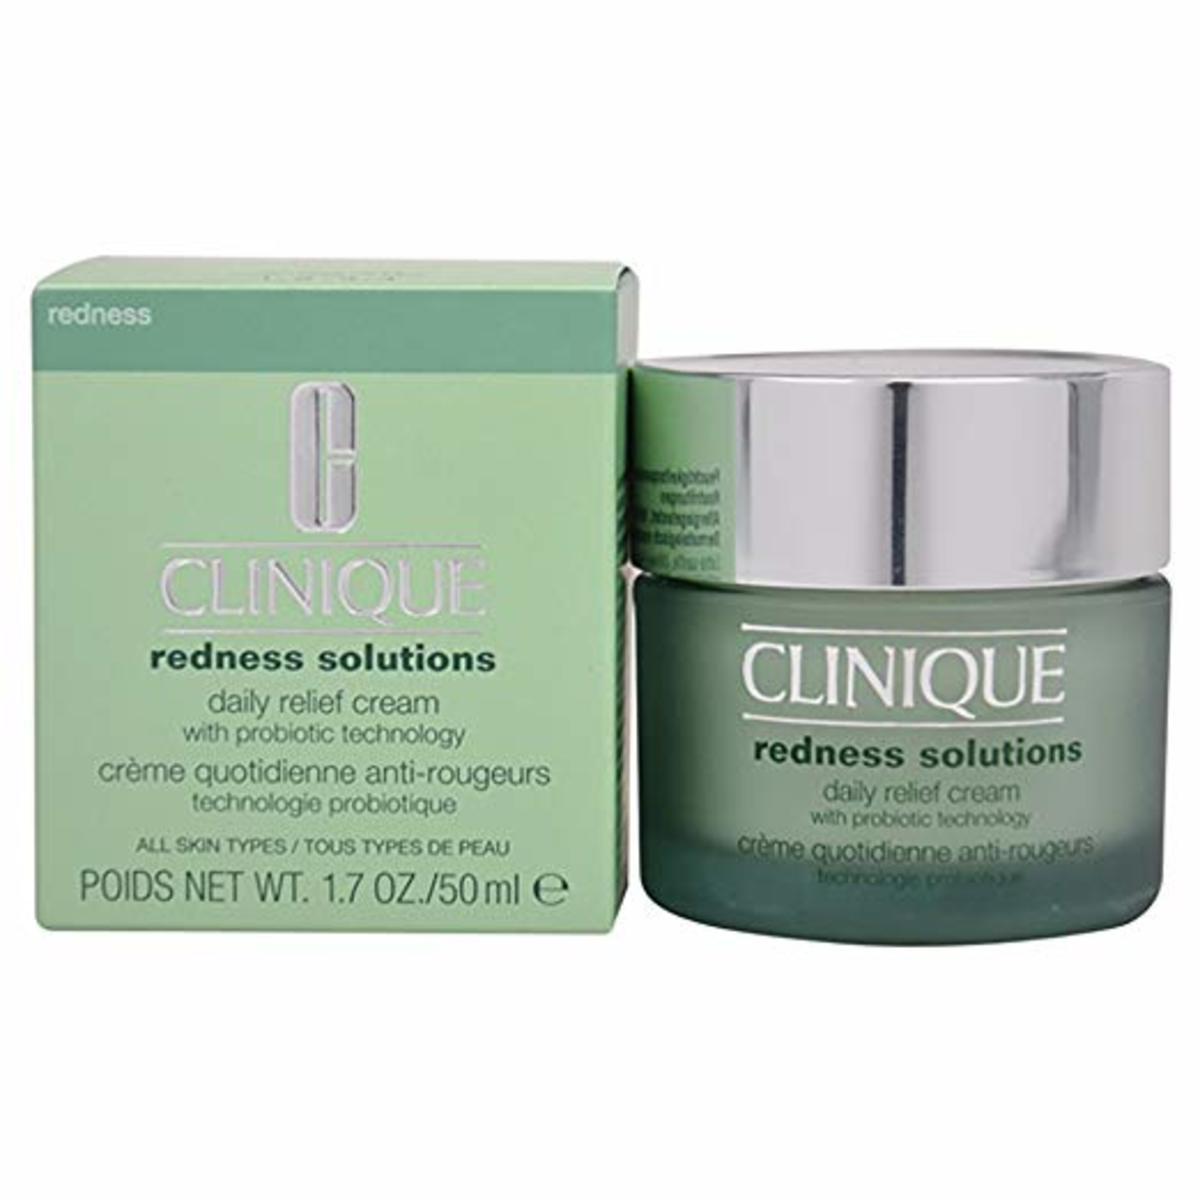 Clinique Redness Solutions Daily Relief Cream - Review